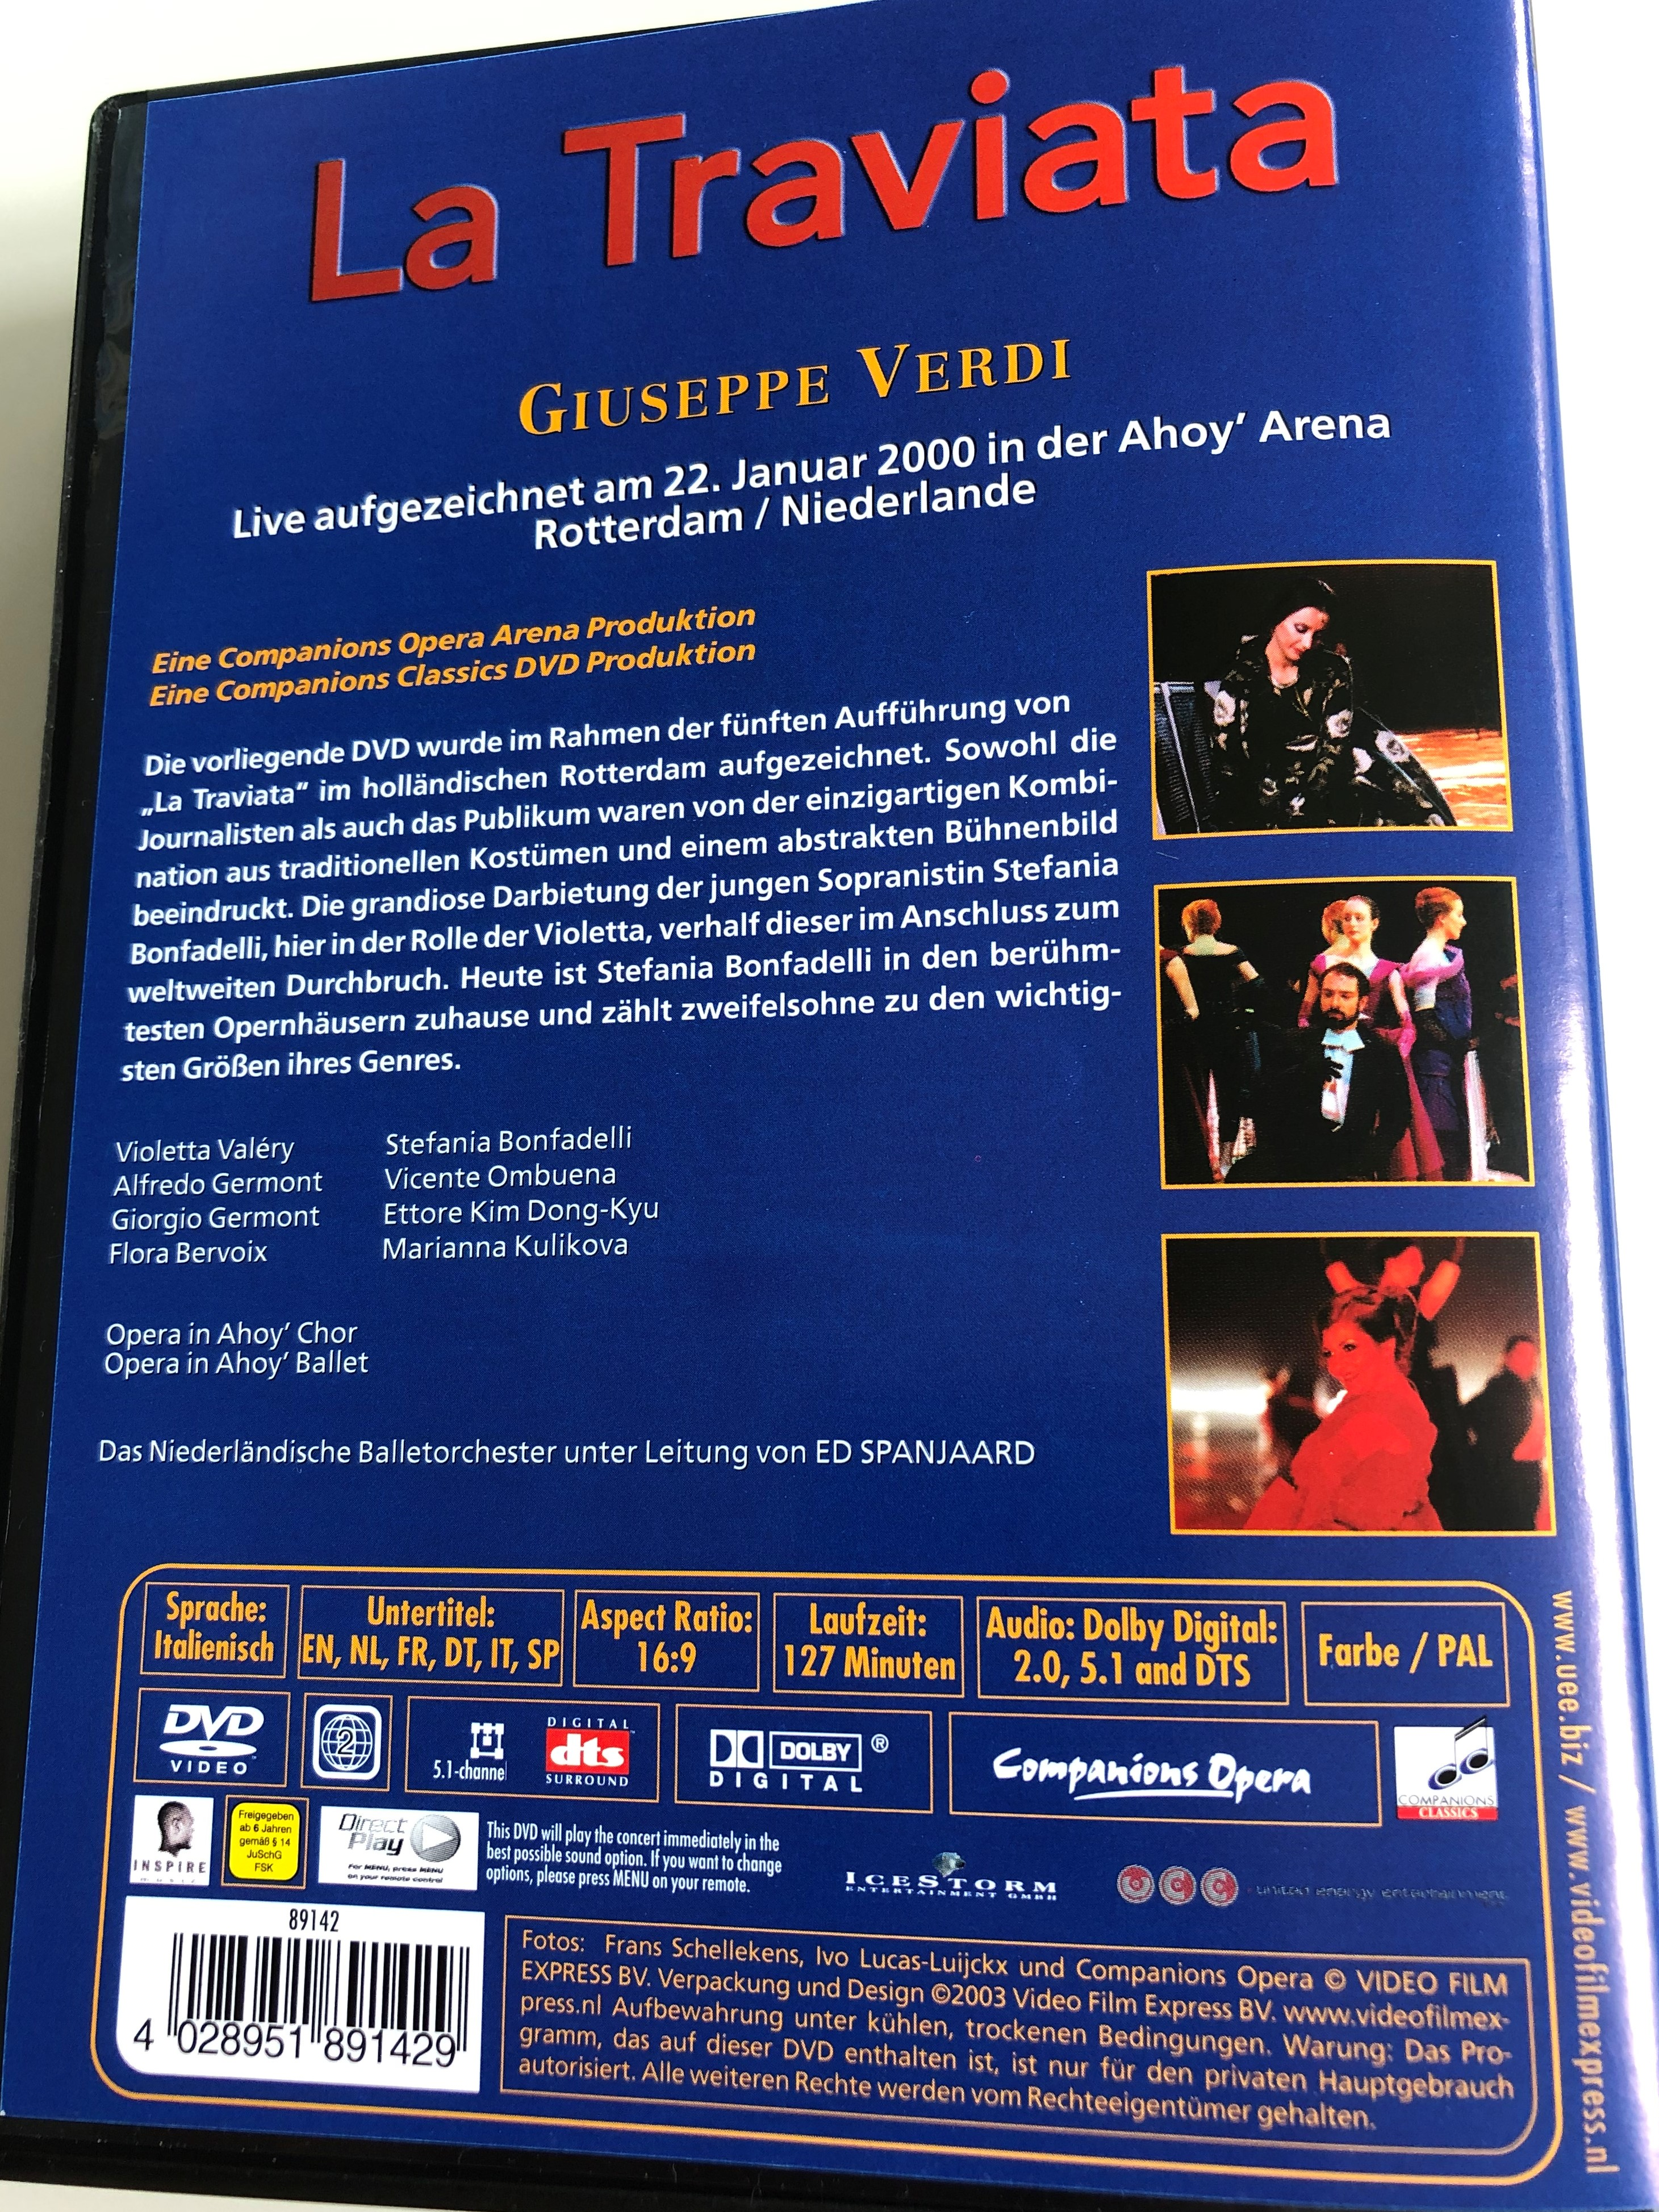 companions-opera-pr-sentiert-la-traviata-giuseppe-verdi-live-aufgezeichnet-im-januar-2000-stefania-bonfadelli-vicente-ombuena-ettore-kim-dong-kyu-marianna-kulikova-niederl-ndische-balletorchester-unter-leitung-von-ed-6619213-.jpg